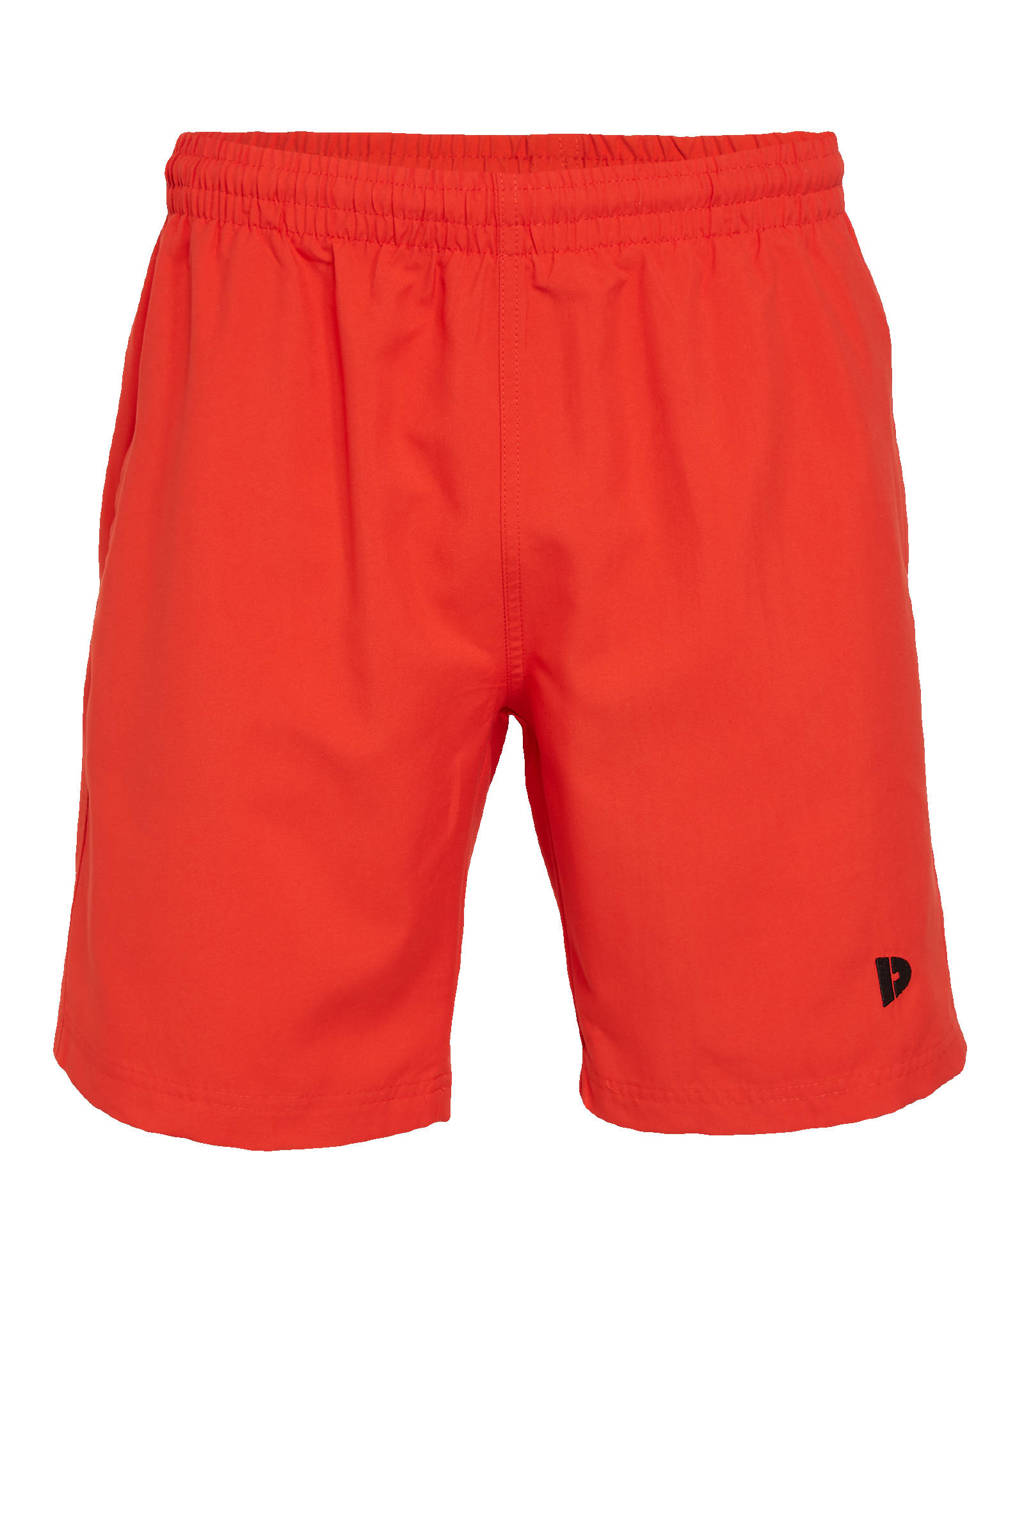 Donnay   sport/zwemshort Dex rood, Rood